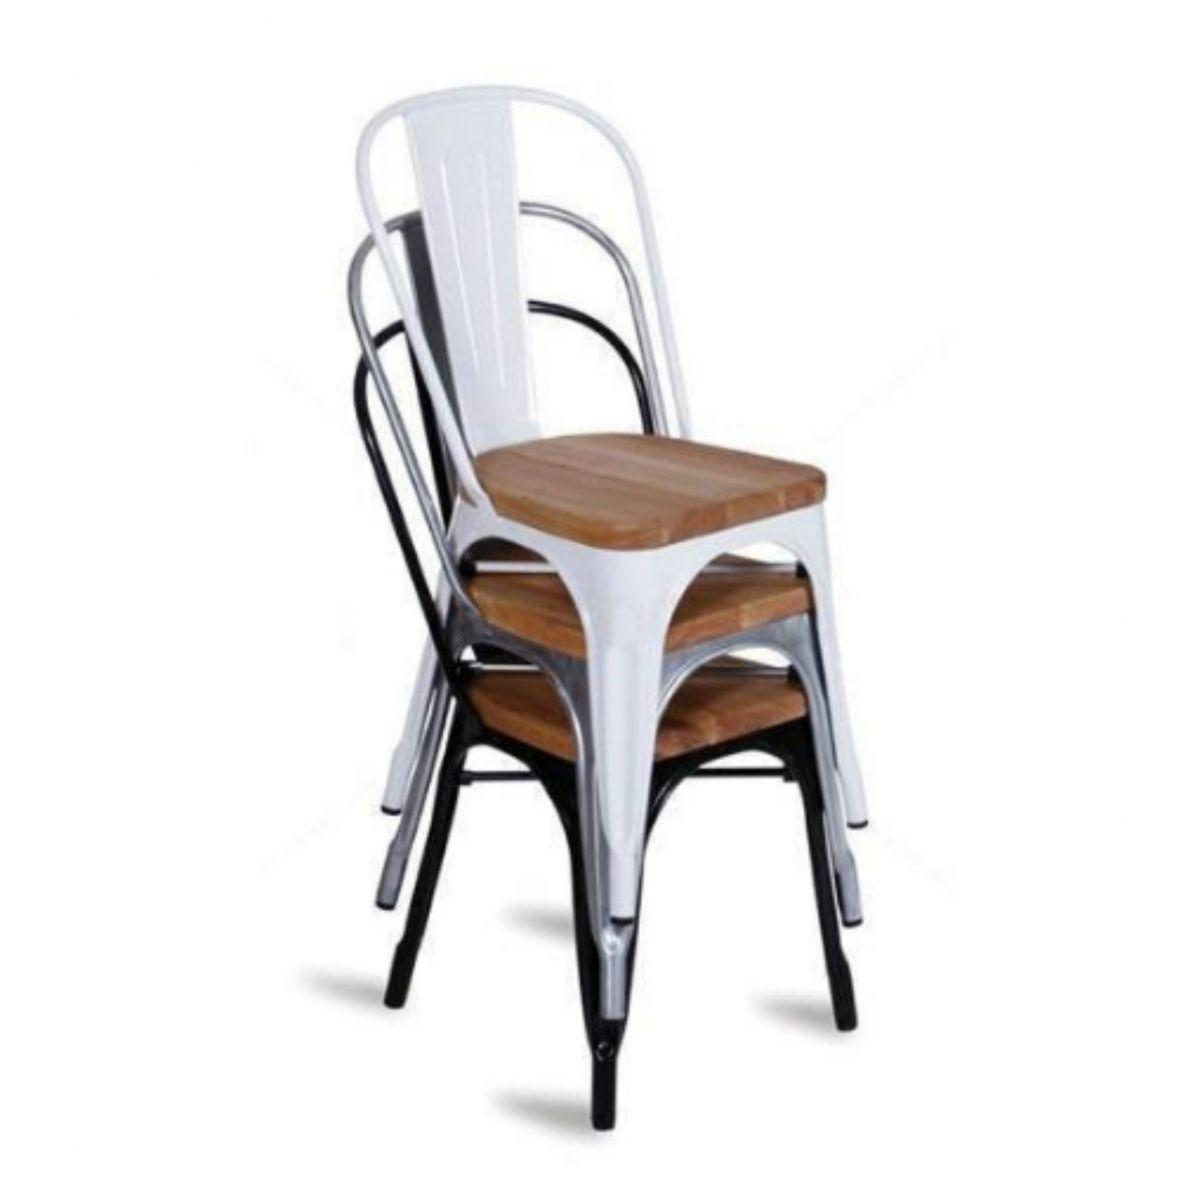 Kit 2 Cadeiras Design Tolix Metal Assento em Madeira Pelegrin PEL-1520